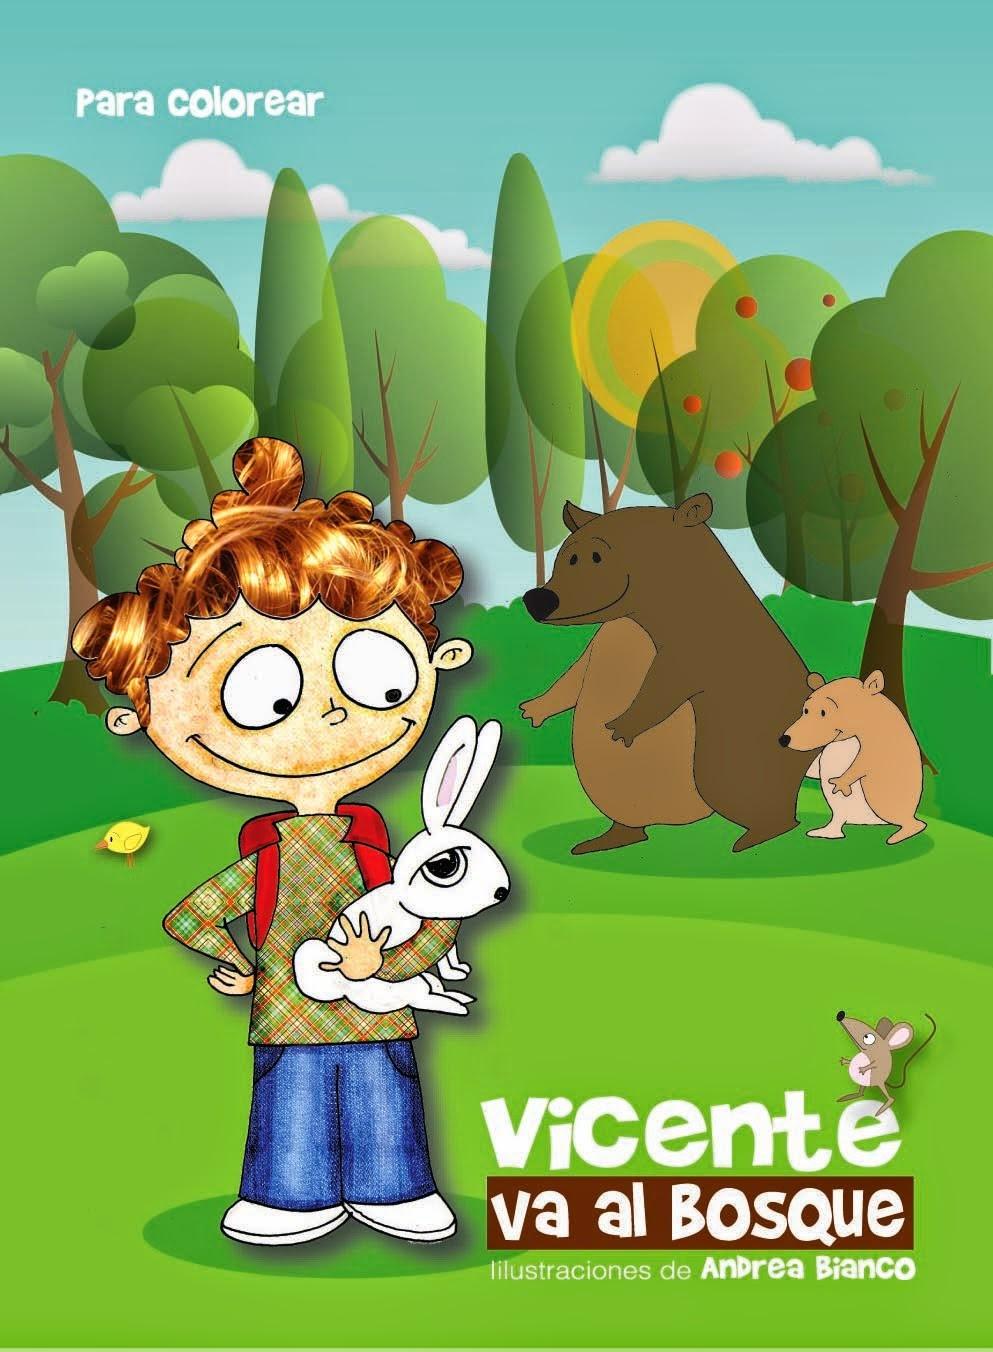 Vicente va al Bosque